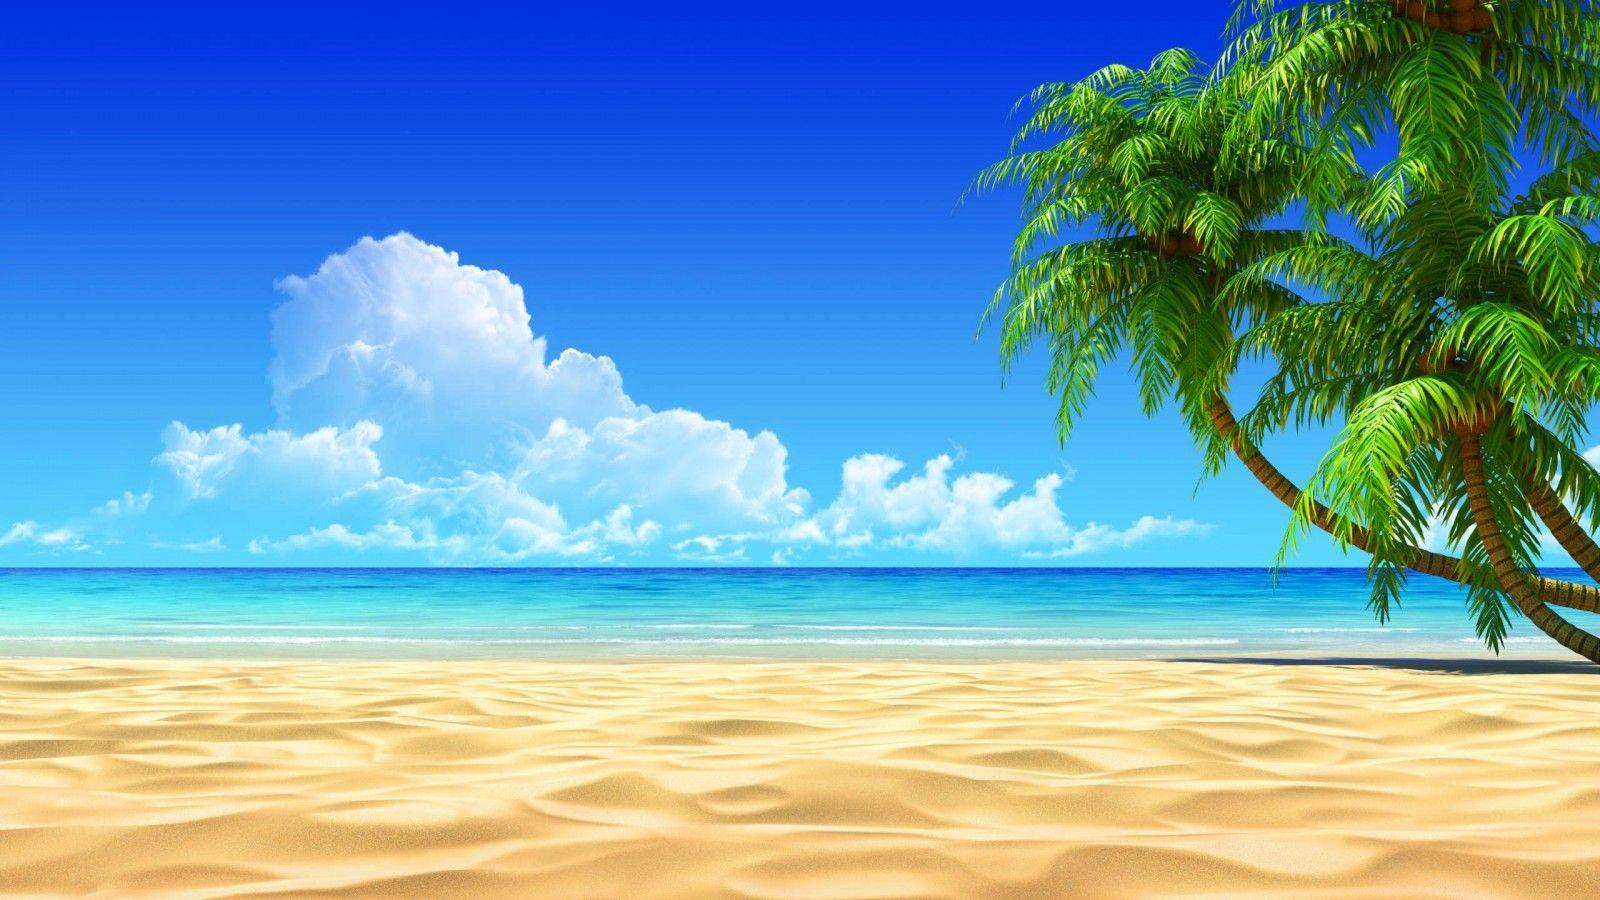 HD Beach Desktop Wallpapers - Top Free HD Beach Desktop